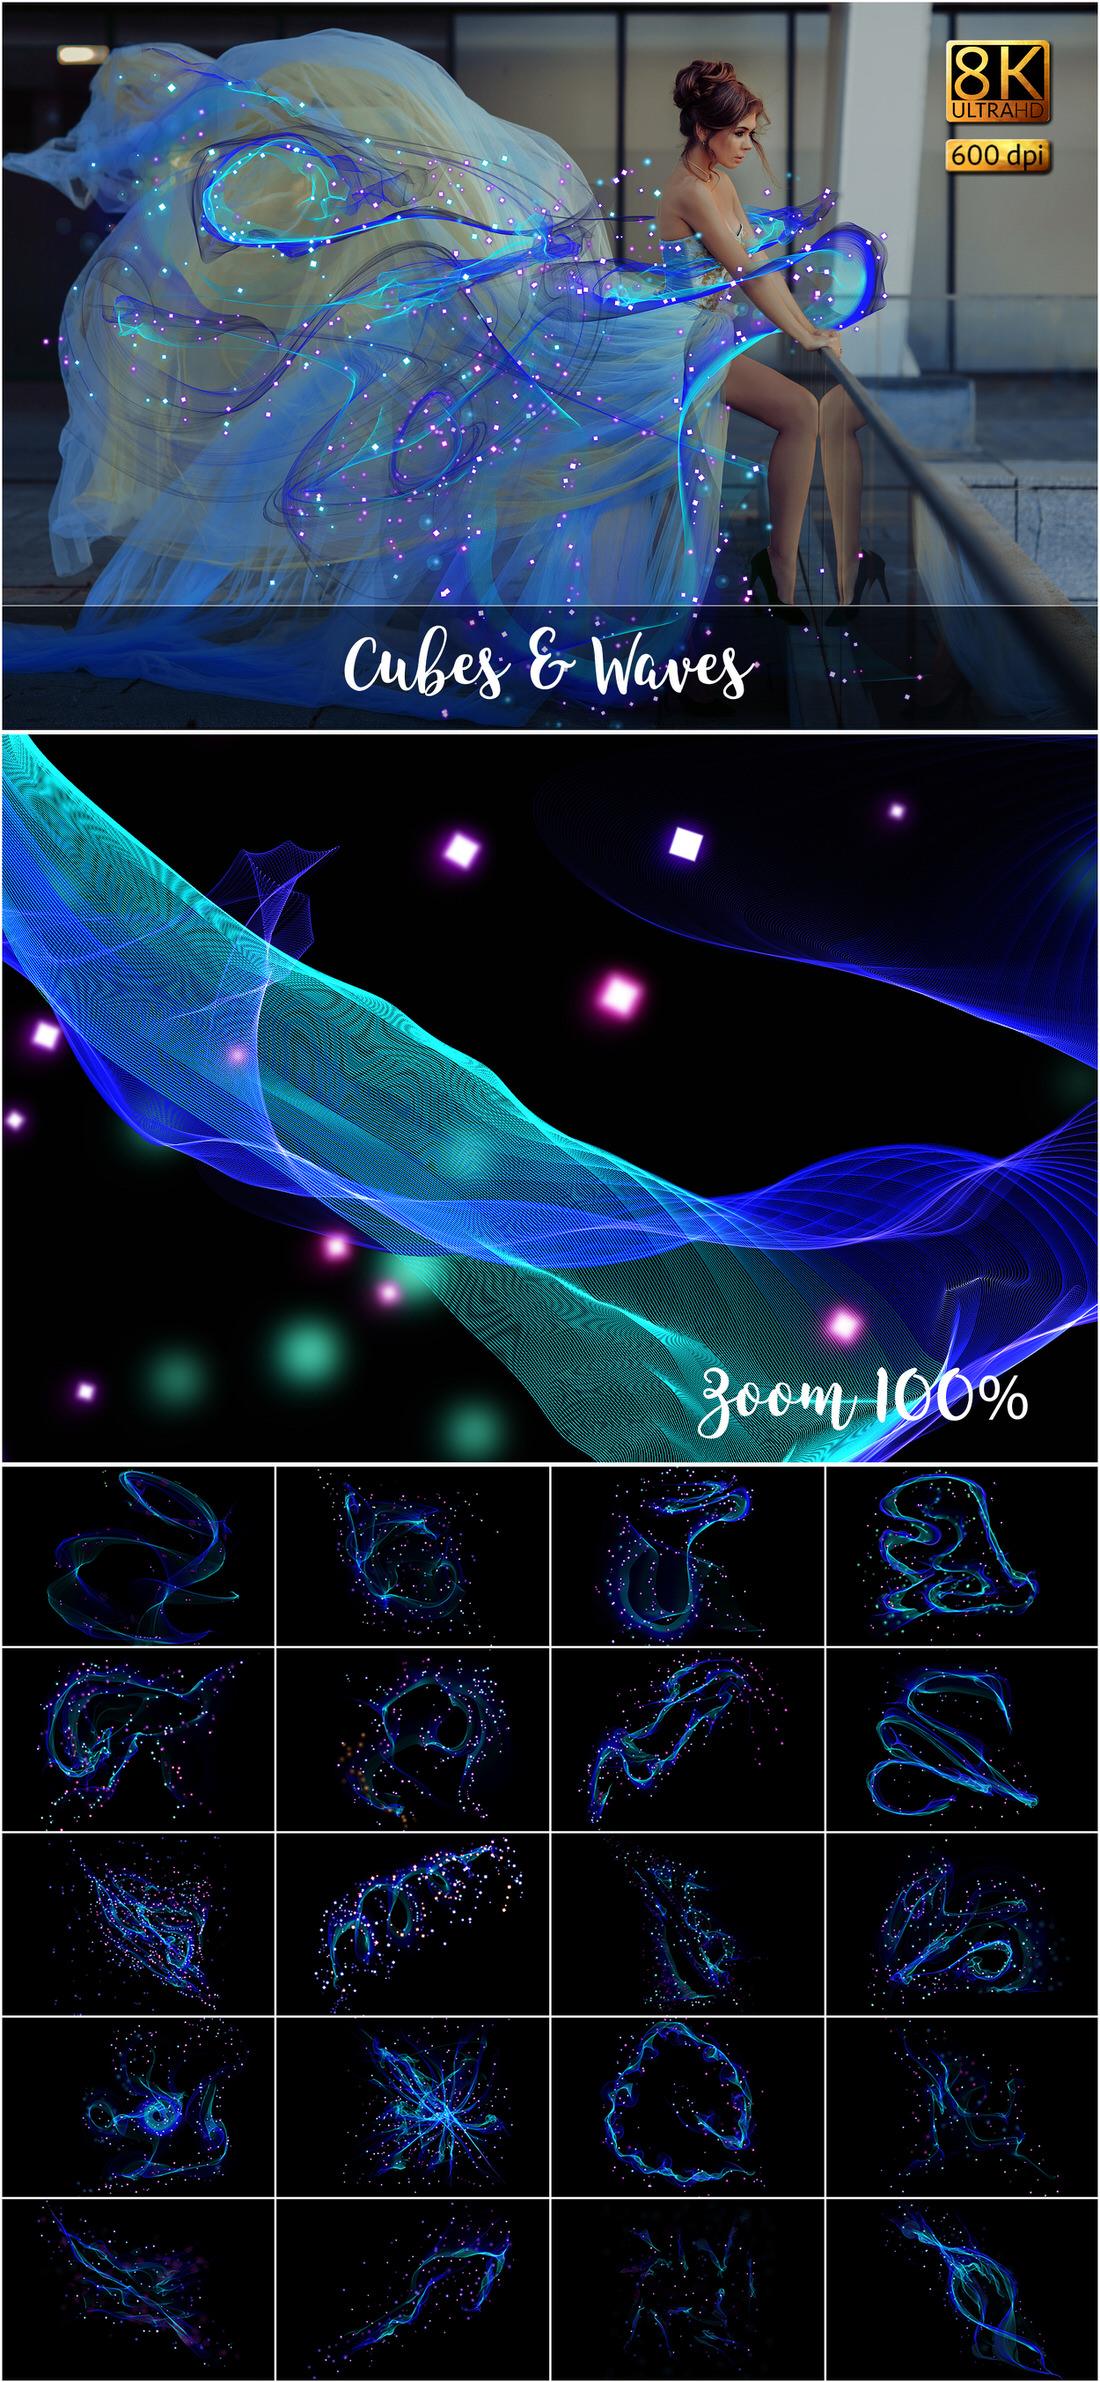 Cubes & Waves.jpg